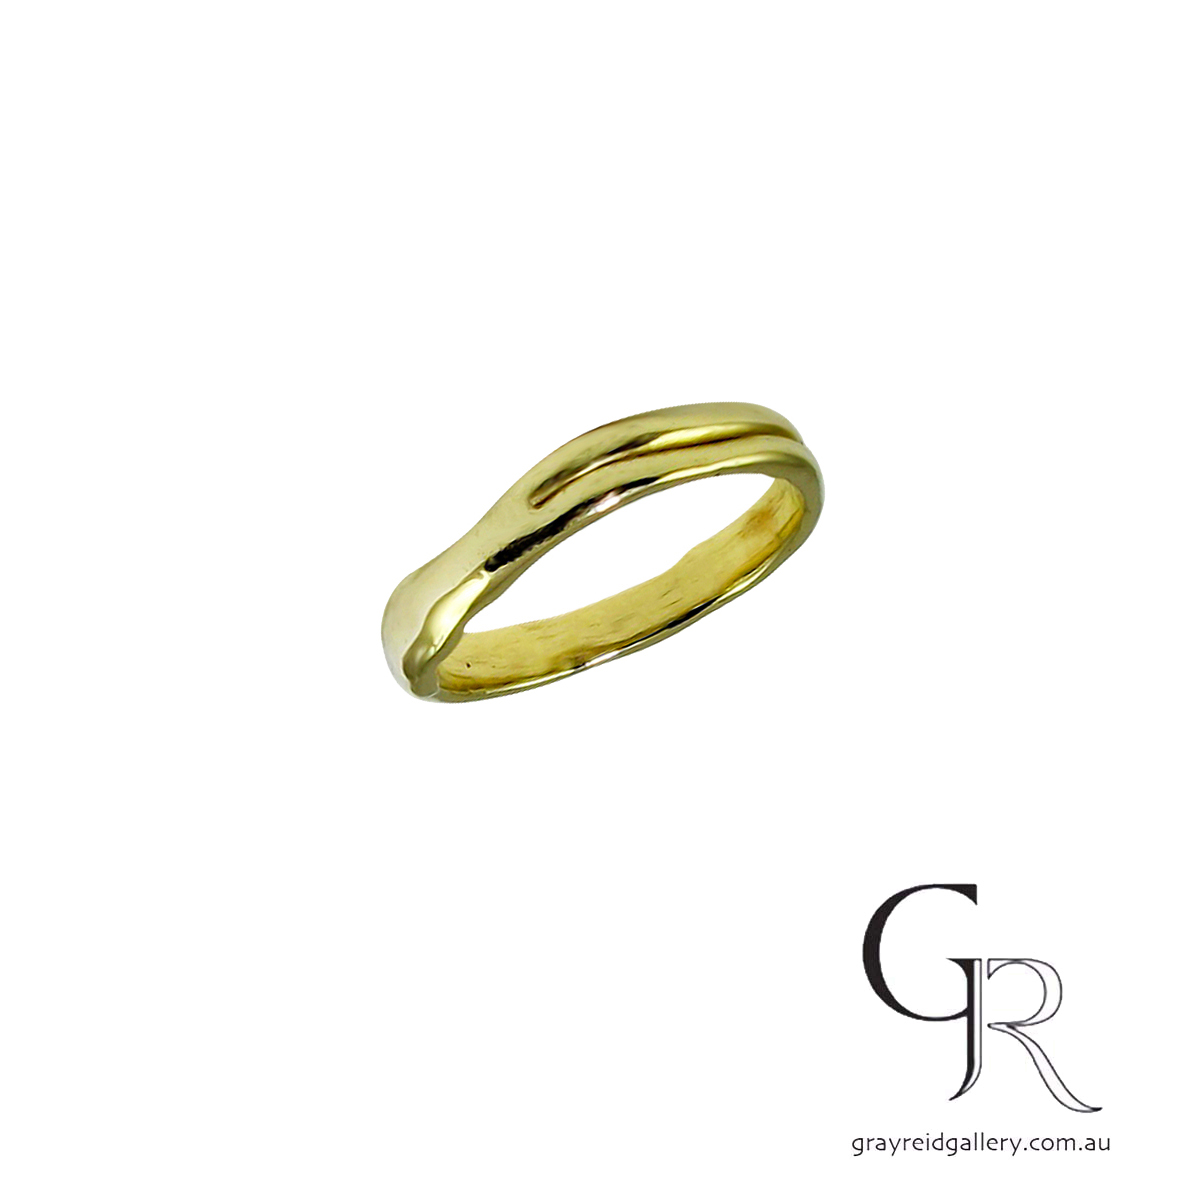 ali Alexander melbourne yellow gold wedding bands melbourne Gray Reid Gallery 7.jpg